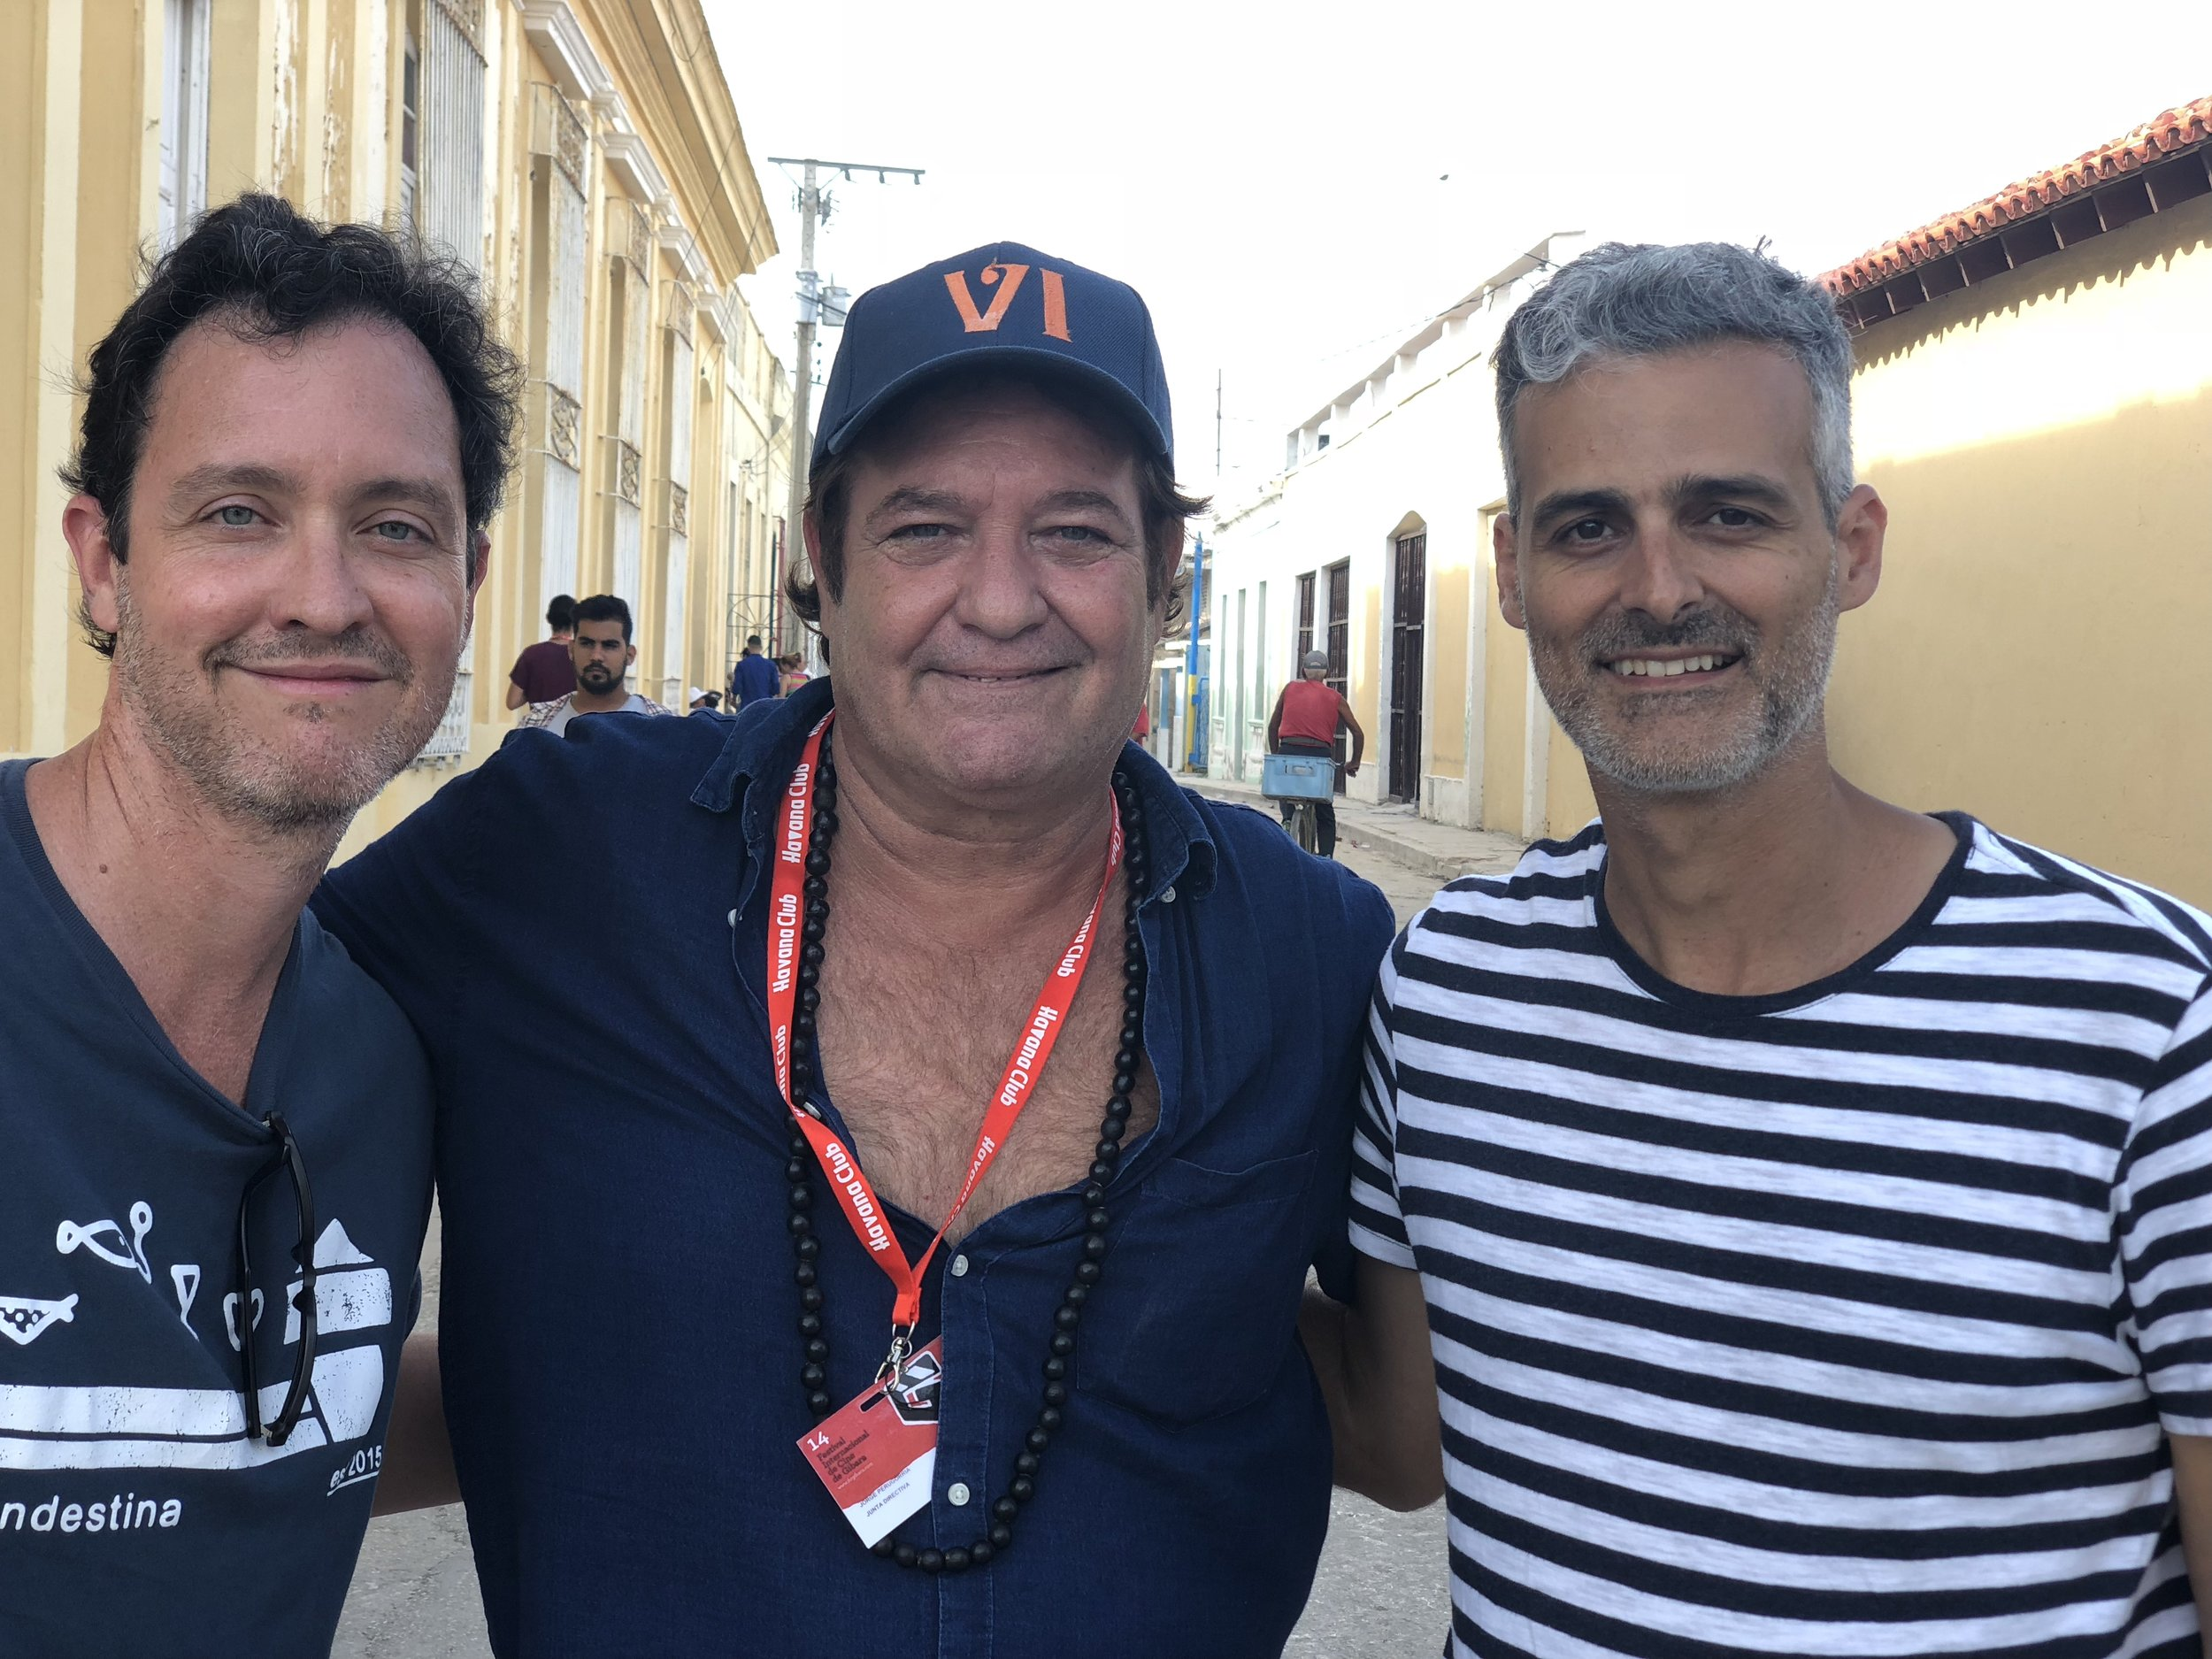 Lights, Camera, Gibara! - Project Binario's Carlos Busquets and Eddy Perez visit the 2018 Gibara International Film Festival near Holguín, Cuba